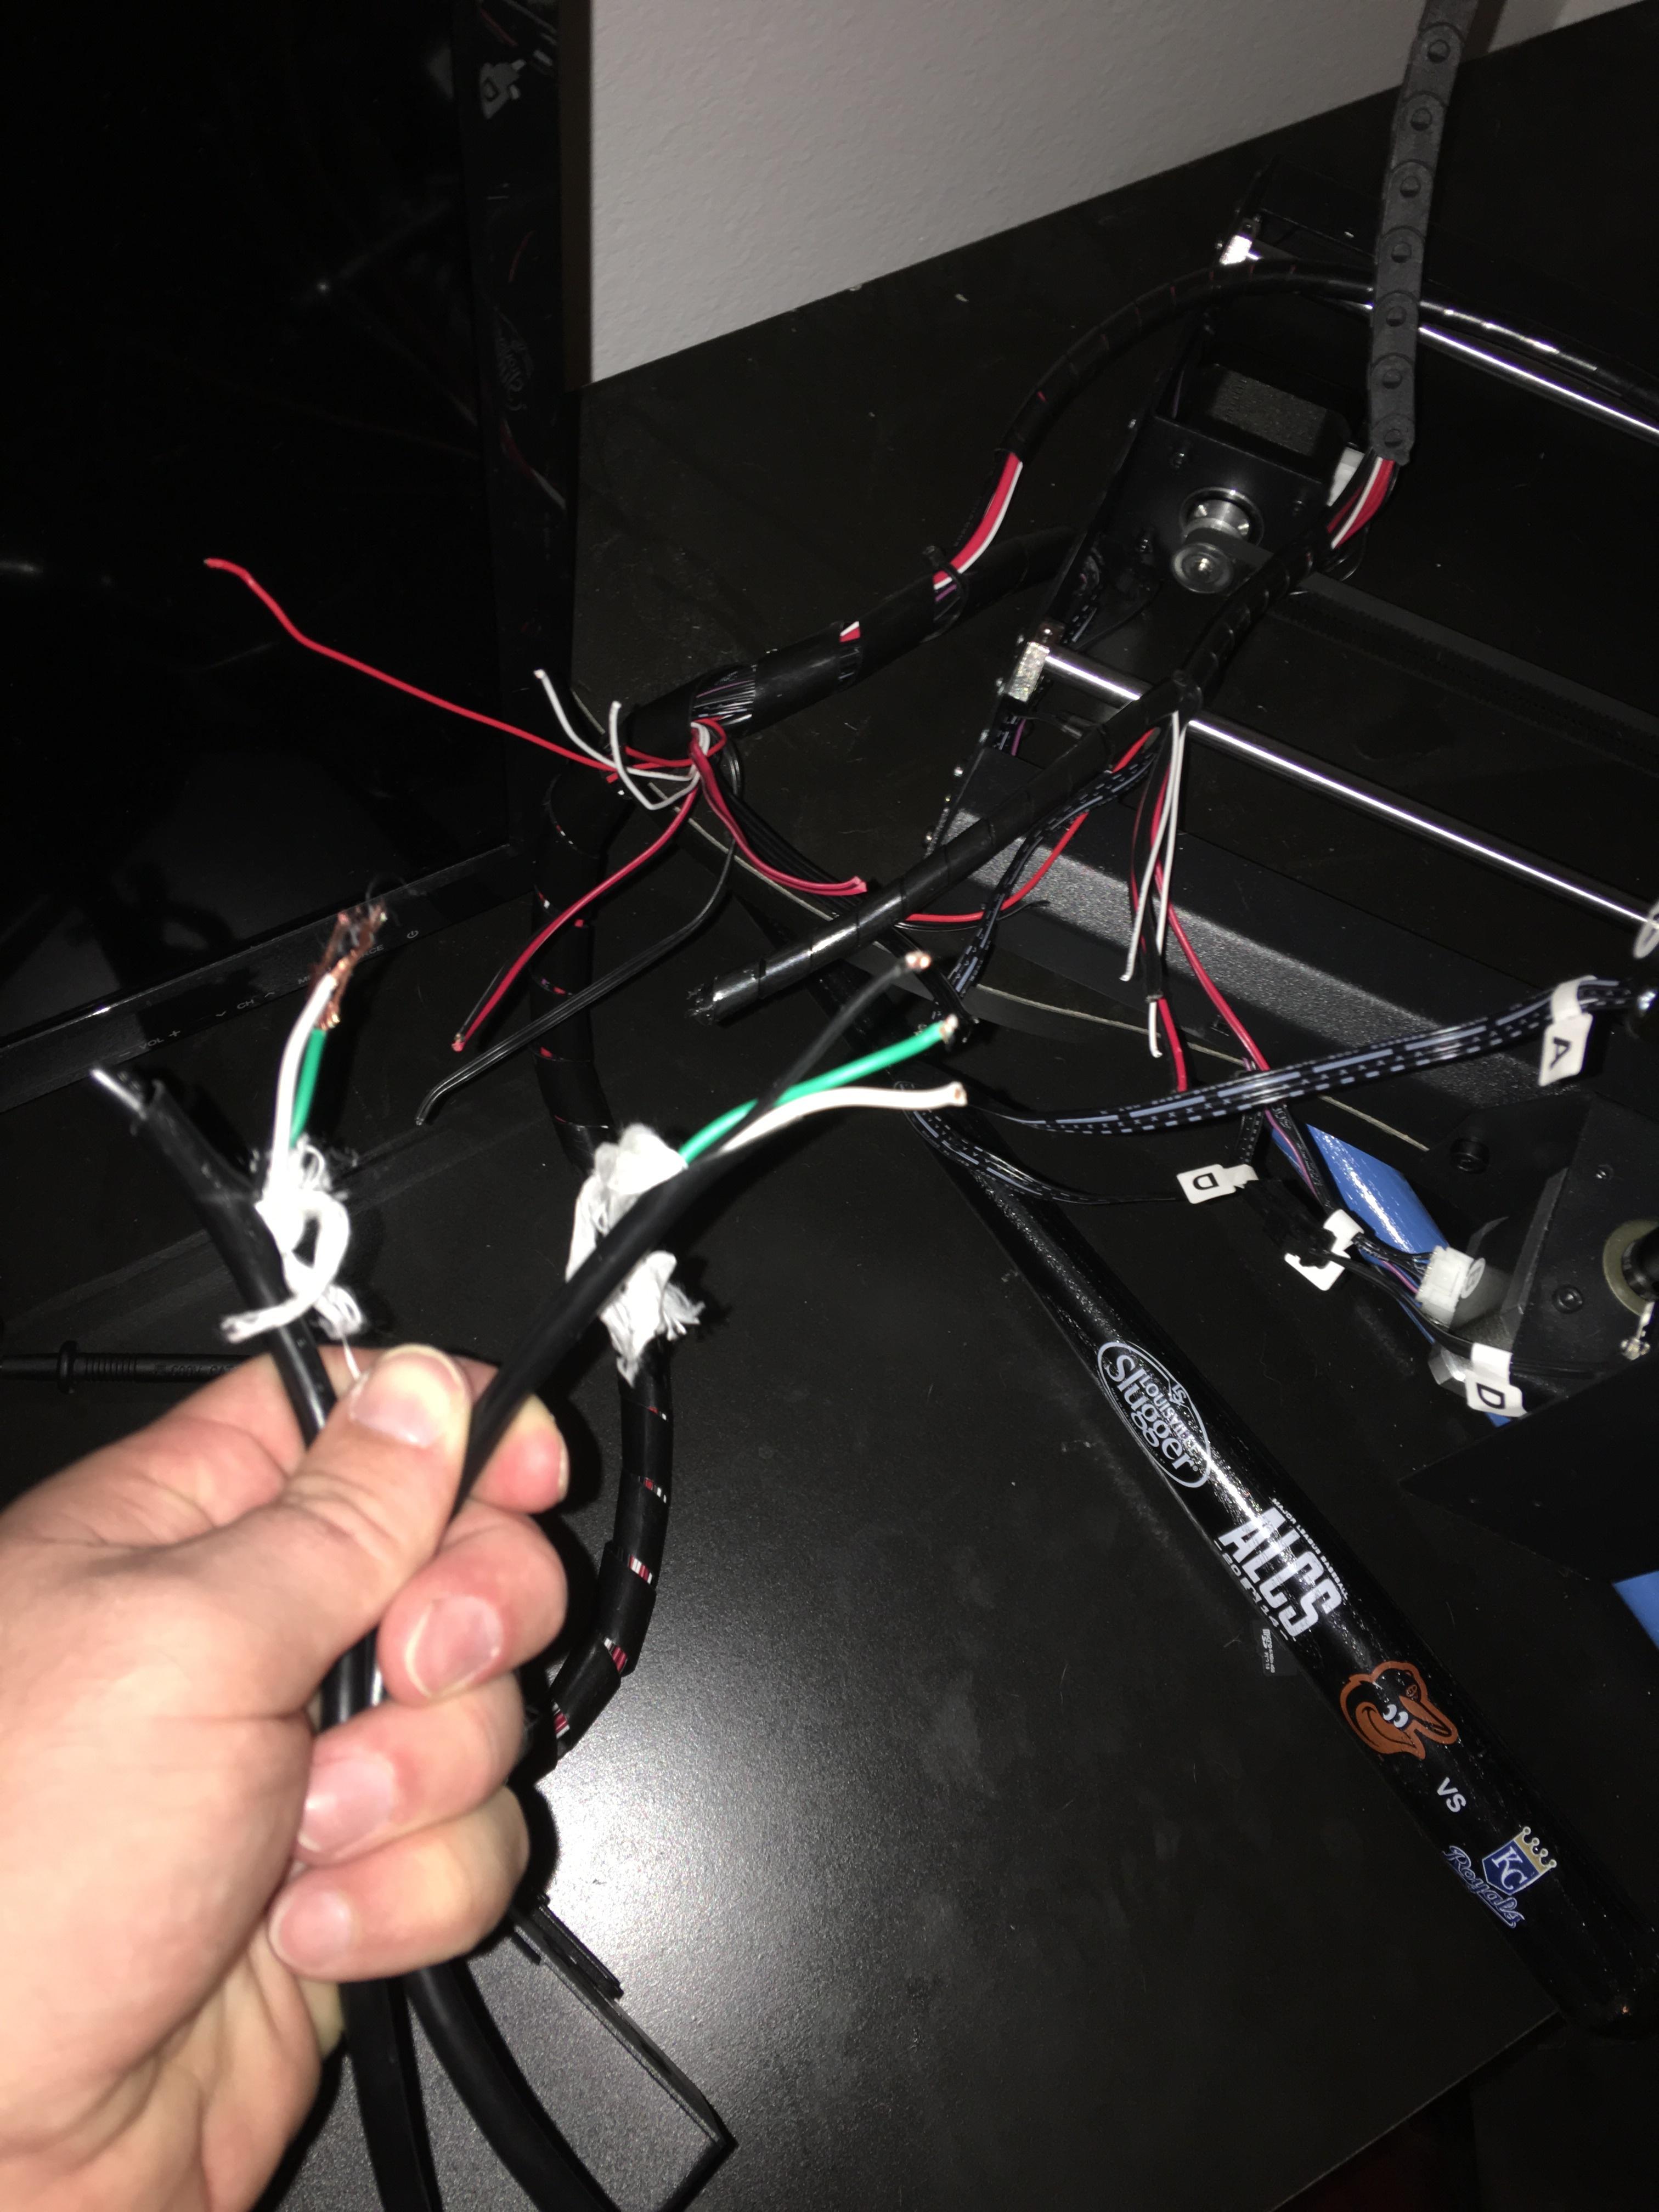 HELP! Dog chewed thru wiring! (i3) - 3D Printers - Talk ...